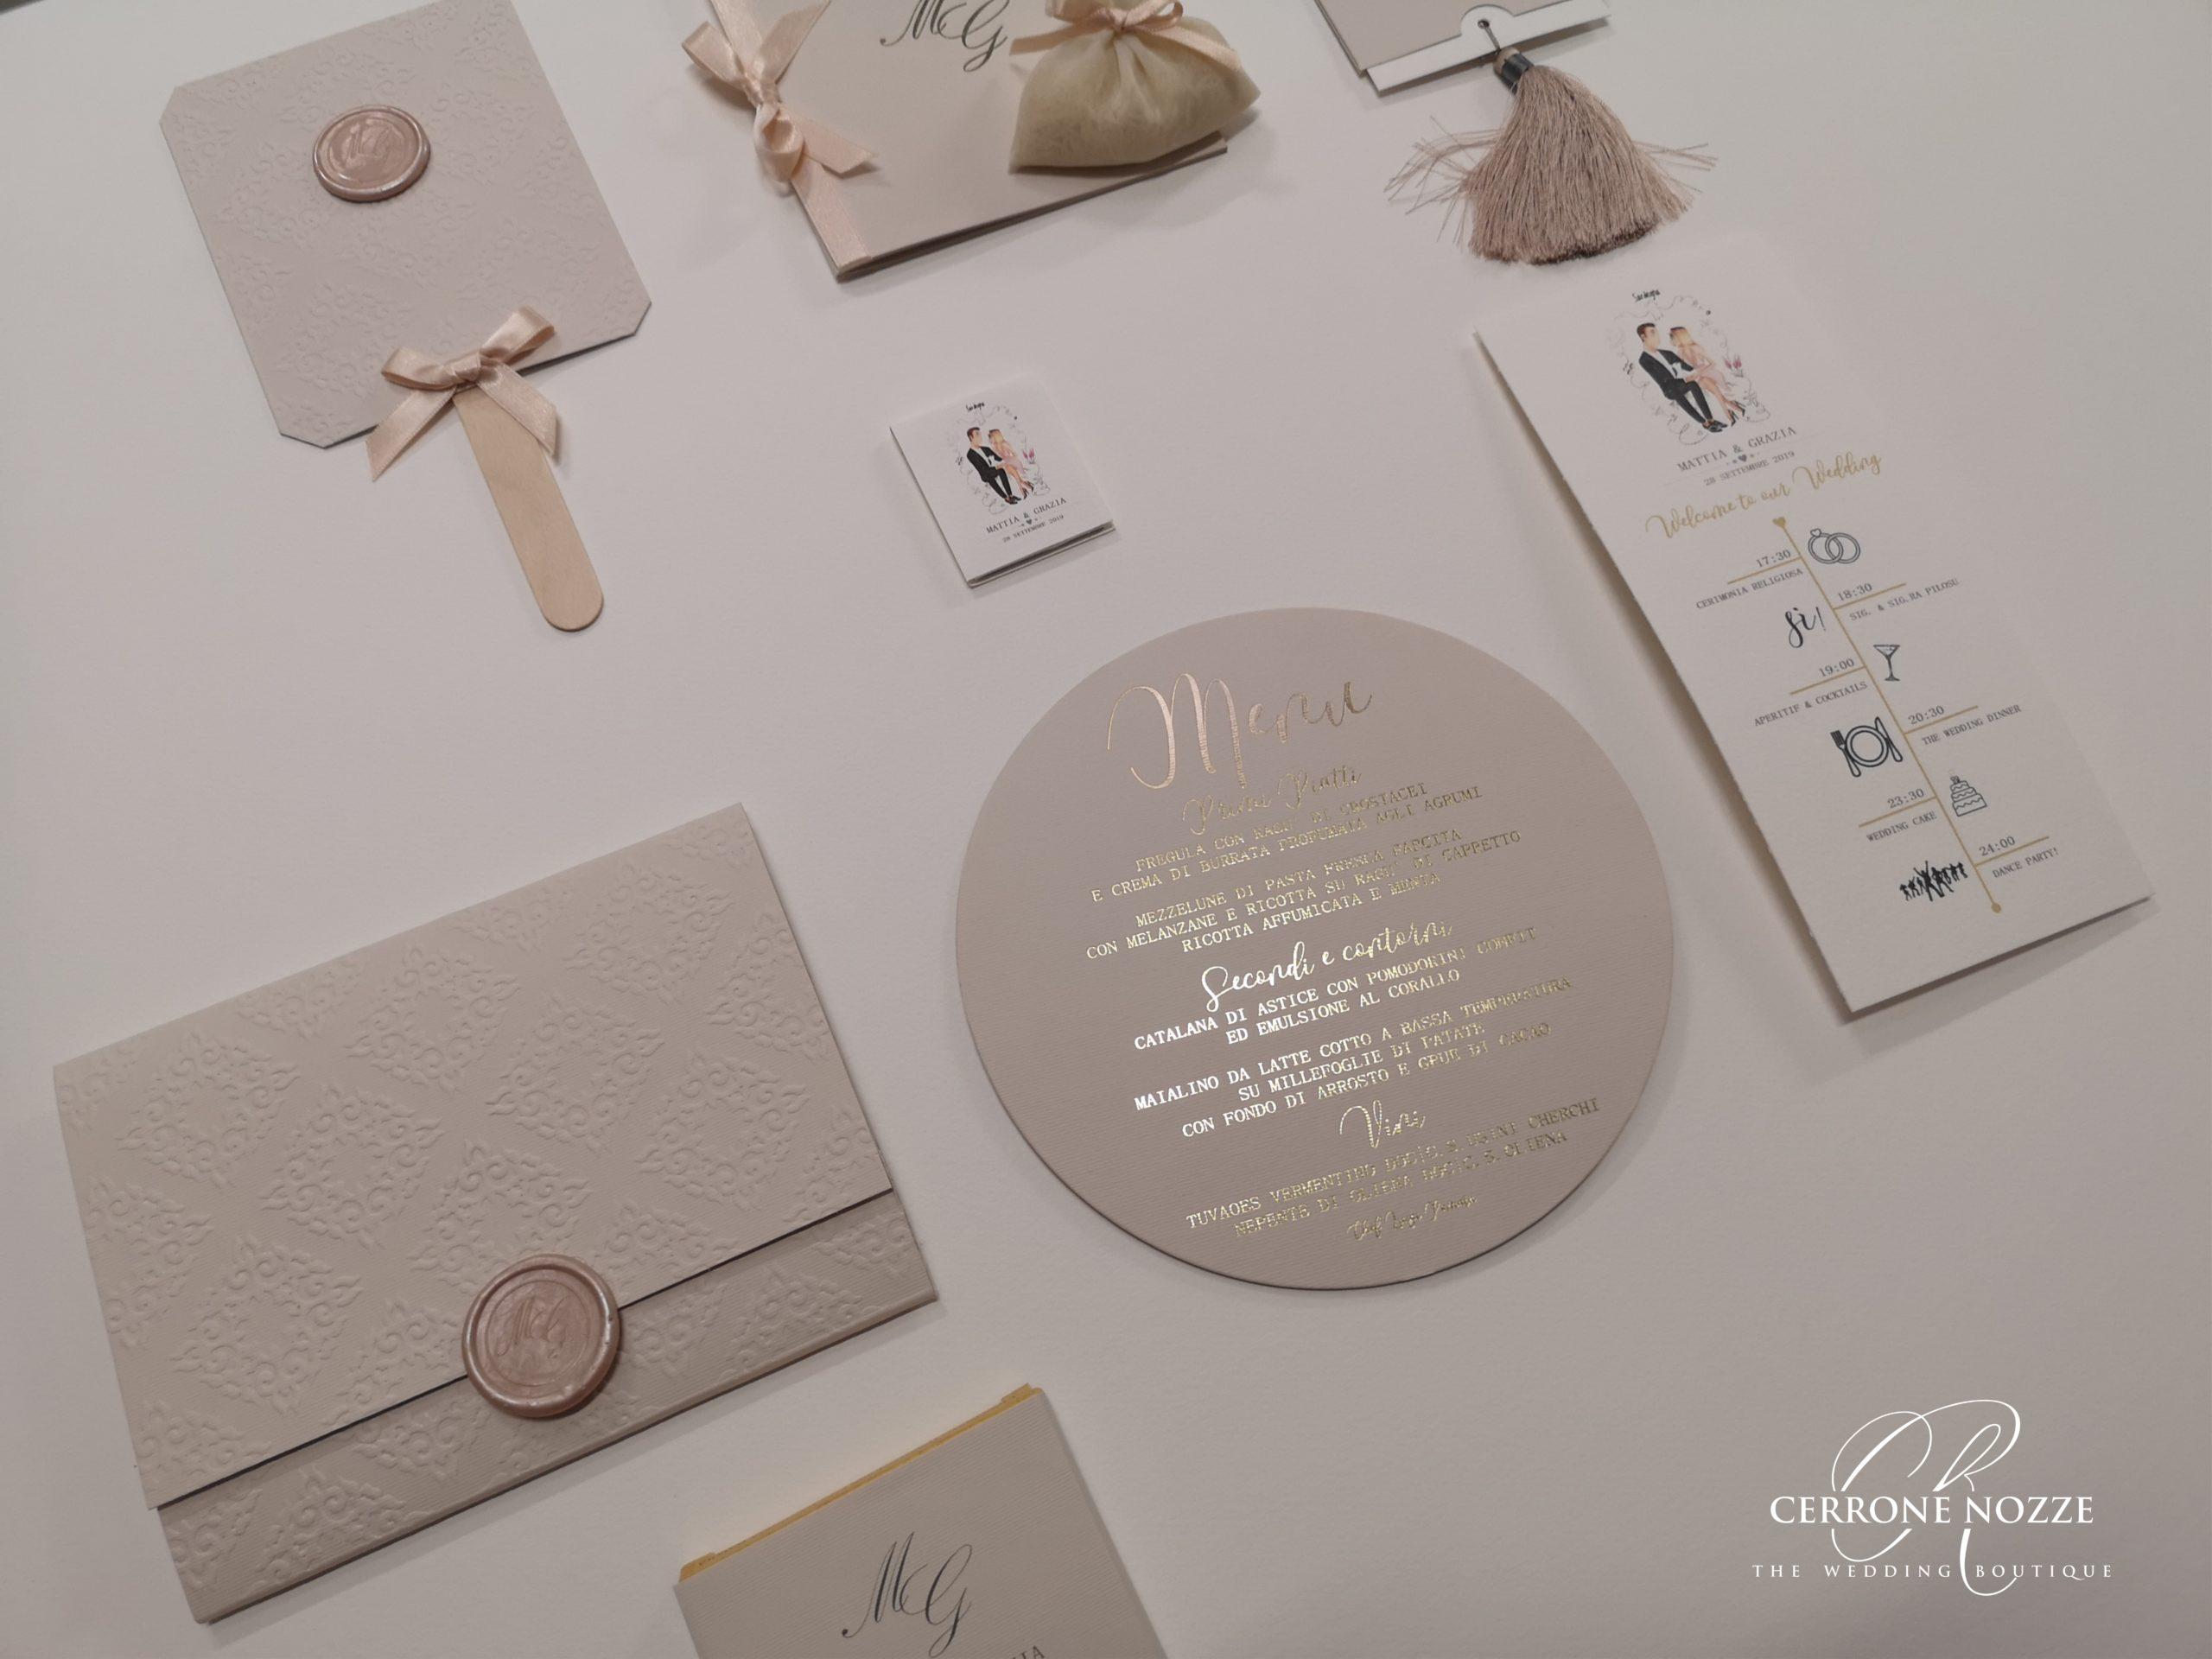 wedding stationery stampa a caldo hotfoil letterpress   Cerrone Nozze wedding boutique